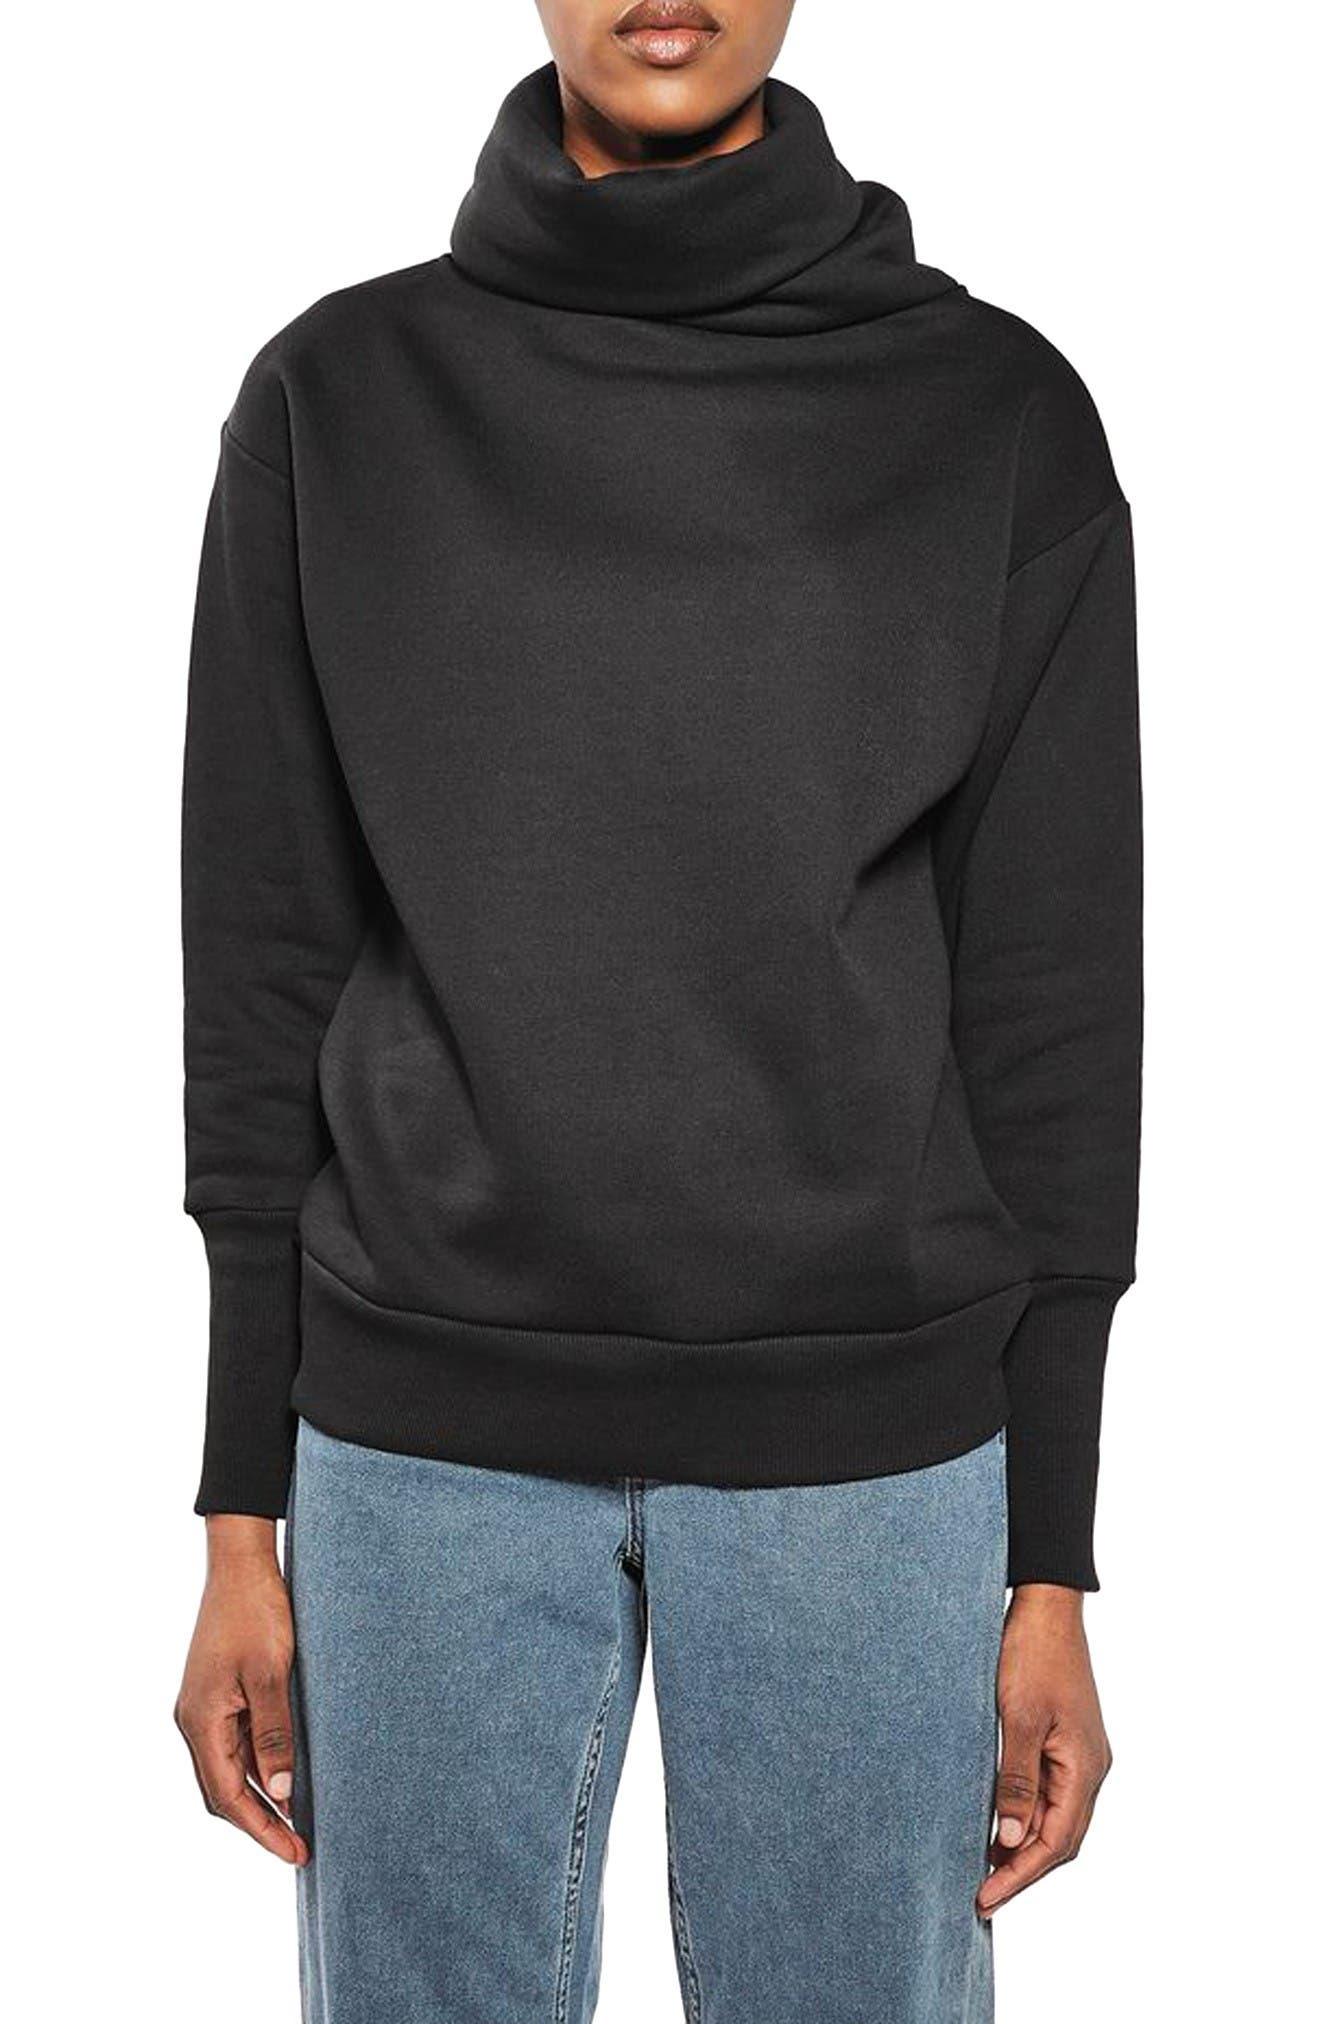 Topshop Boutique Diana Cowl Sweatshirt